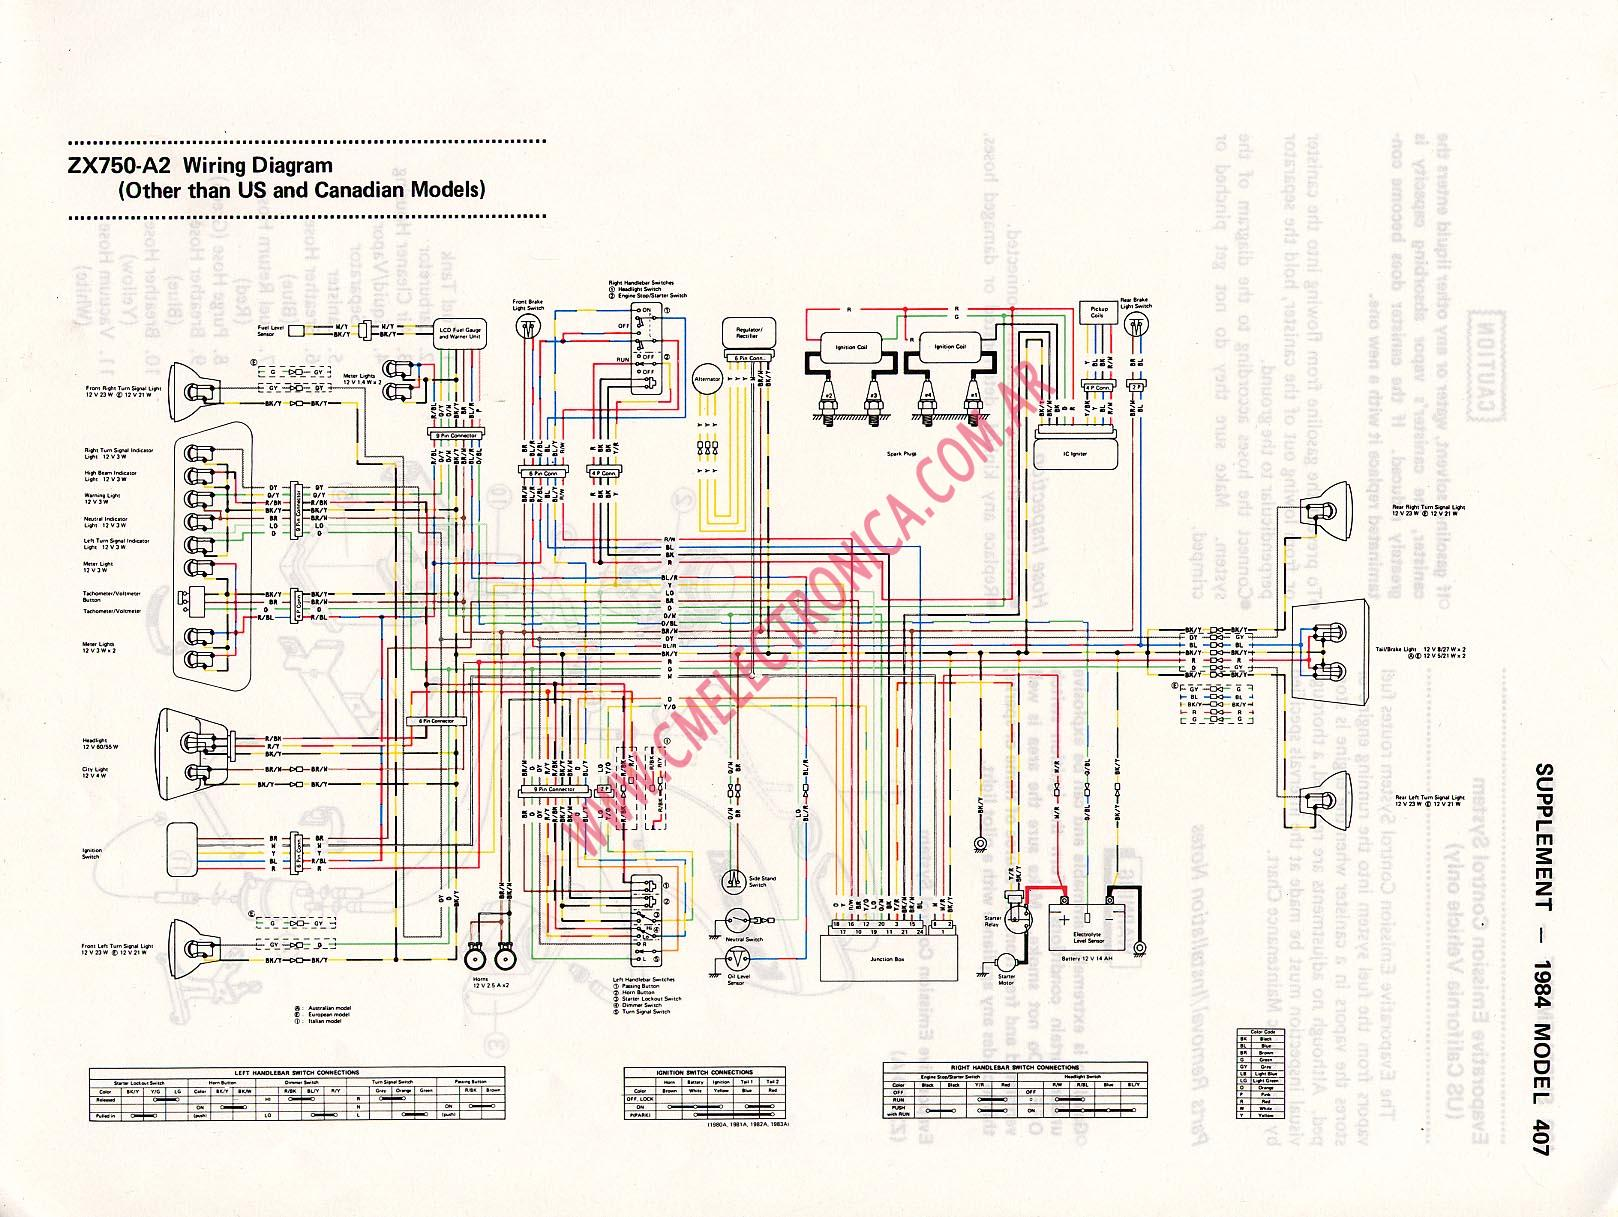 kawasaki gpz750r?resize\\=1618%2C1217 100 [ 2006 kawasaki zzr 600 service manual ] zzr 400 wiring diagram at bayanpartner.co